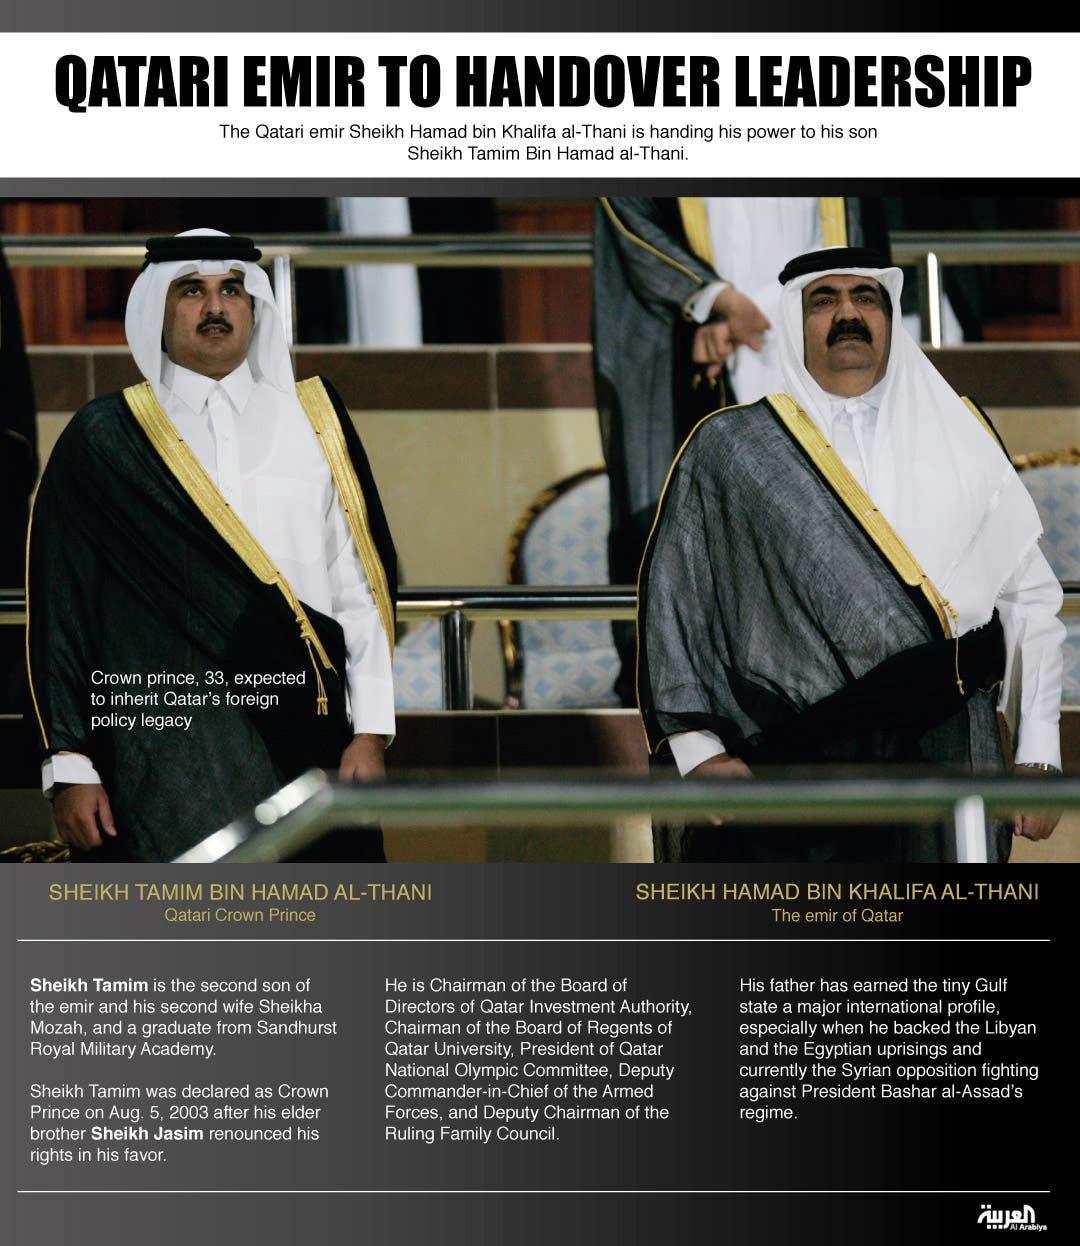 Infographic: Qatari emir to handover leadership (Design by Farwa Rizwan / Al Arabiya English)